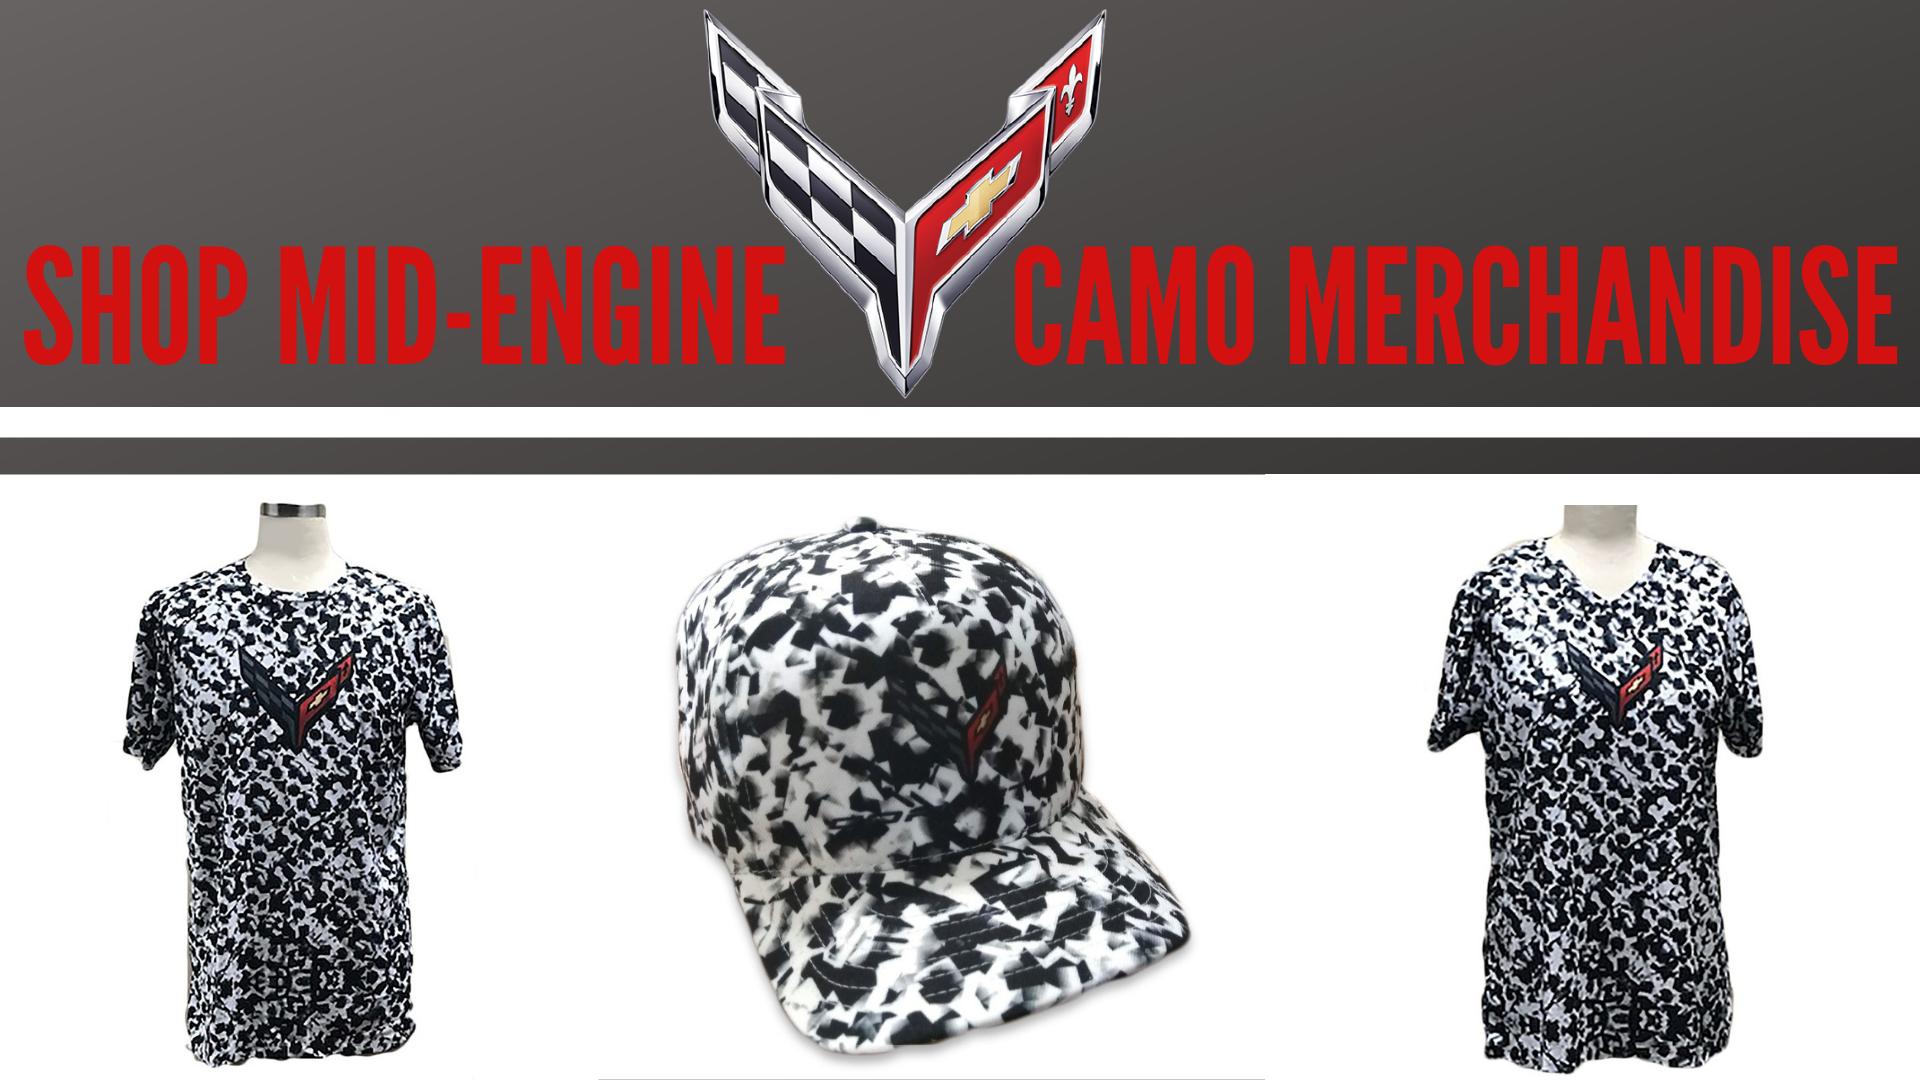 Mid-Engine Camp Merchandise